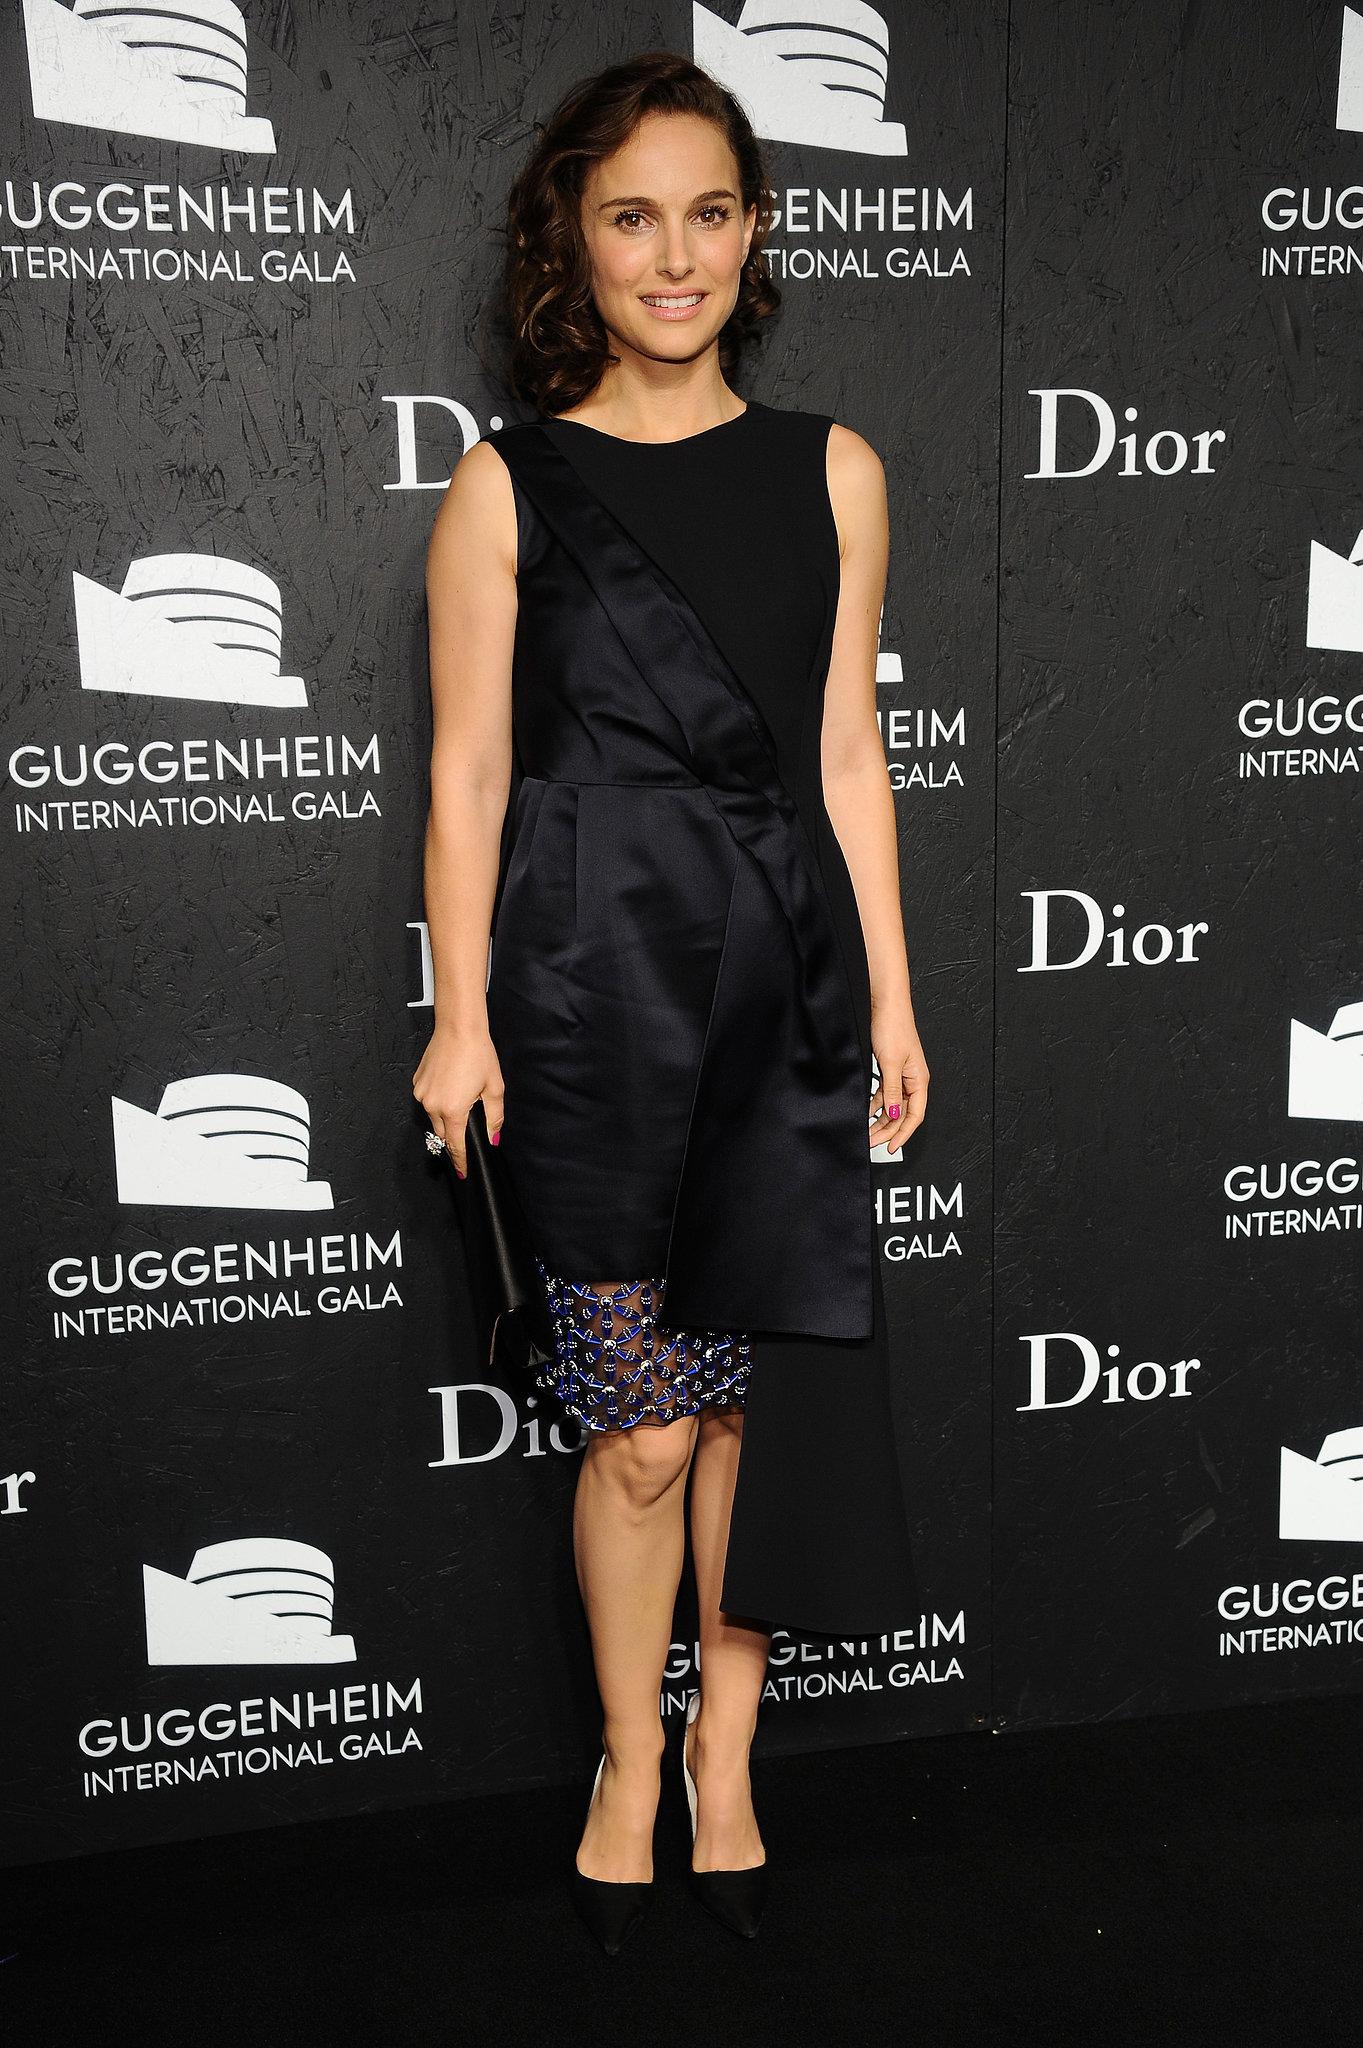 Natalie Portman wore a Dior dress to the Guggenheim International Gala in NYC.